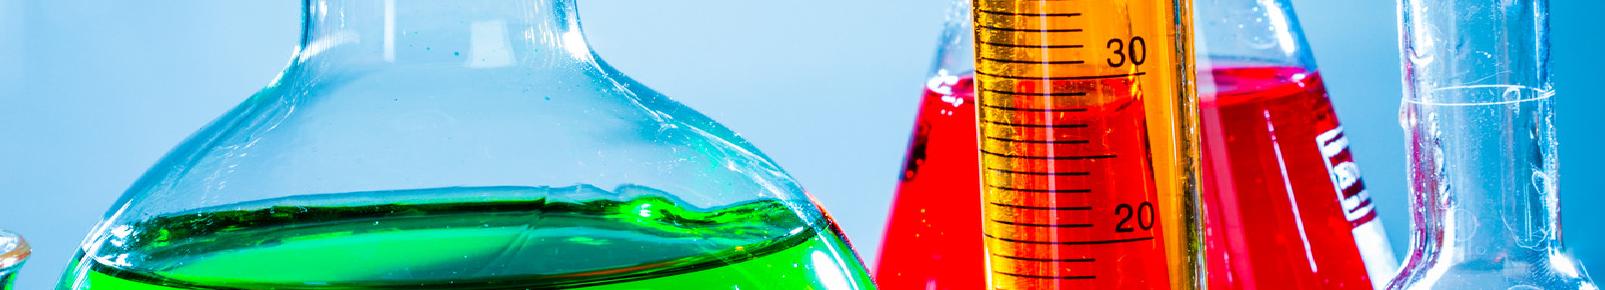 Novagard Chemistry - Silicone Sealant & Adhesive   Silicone Grease